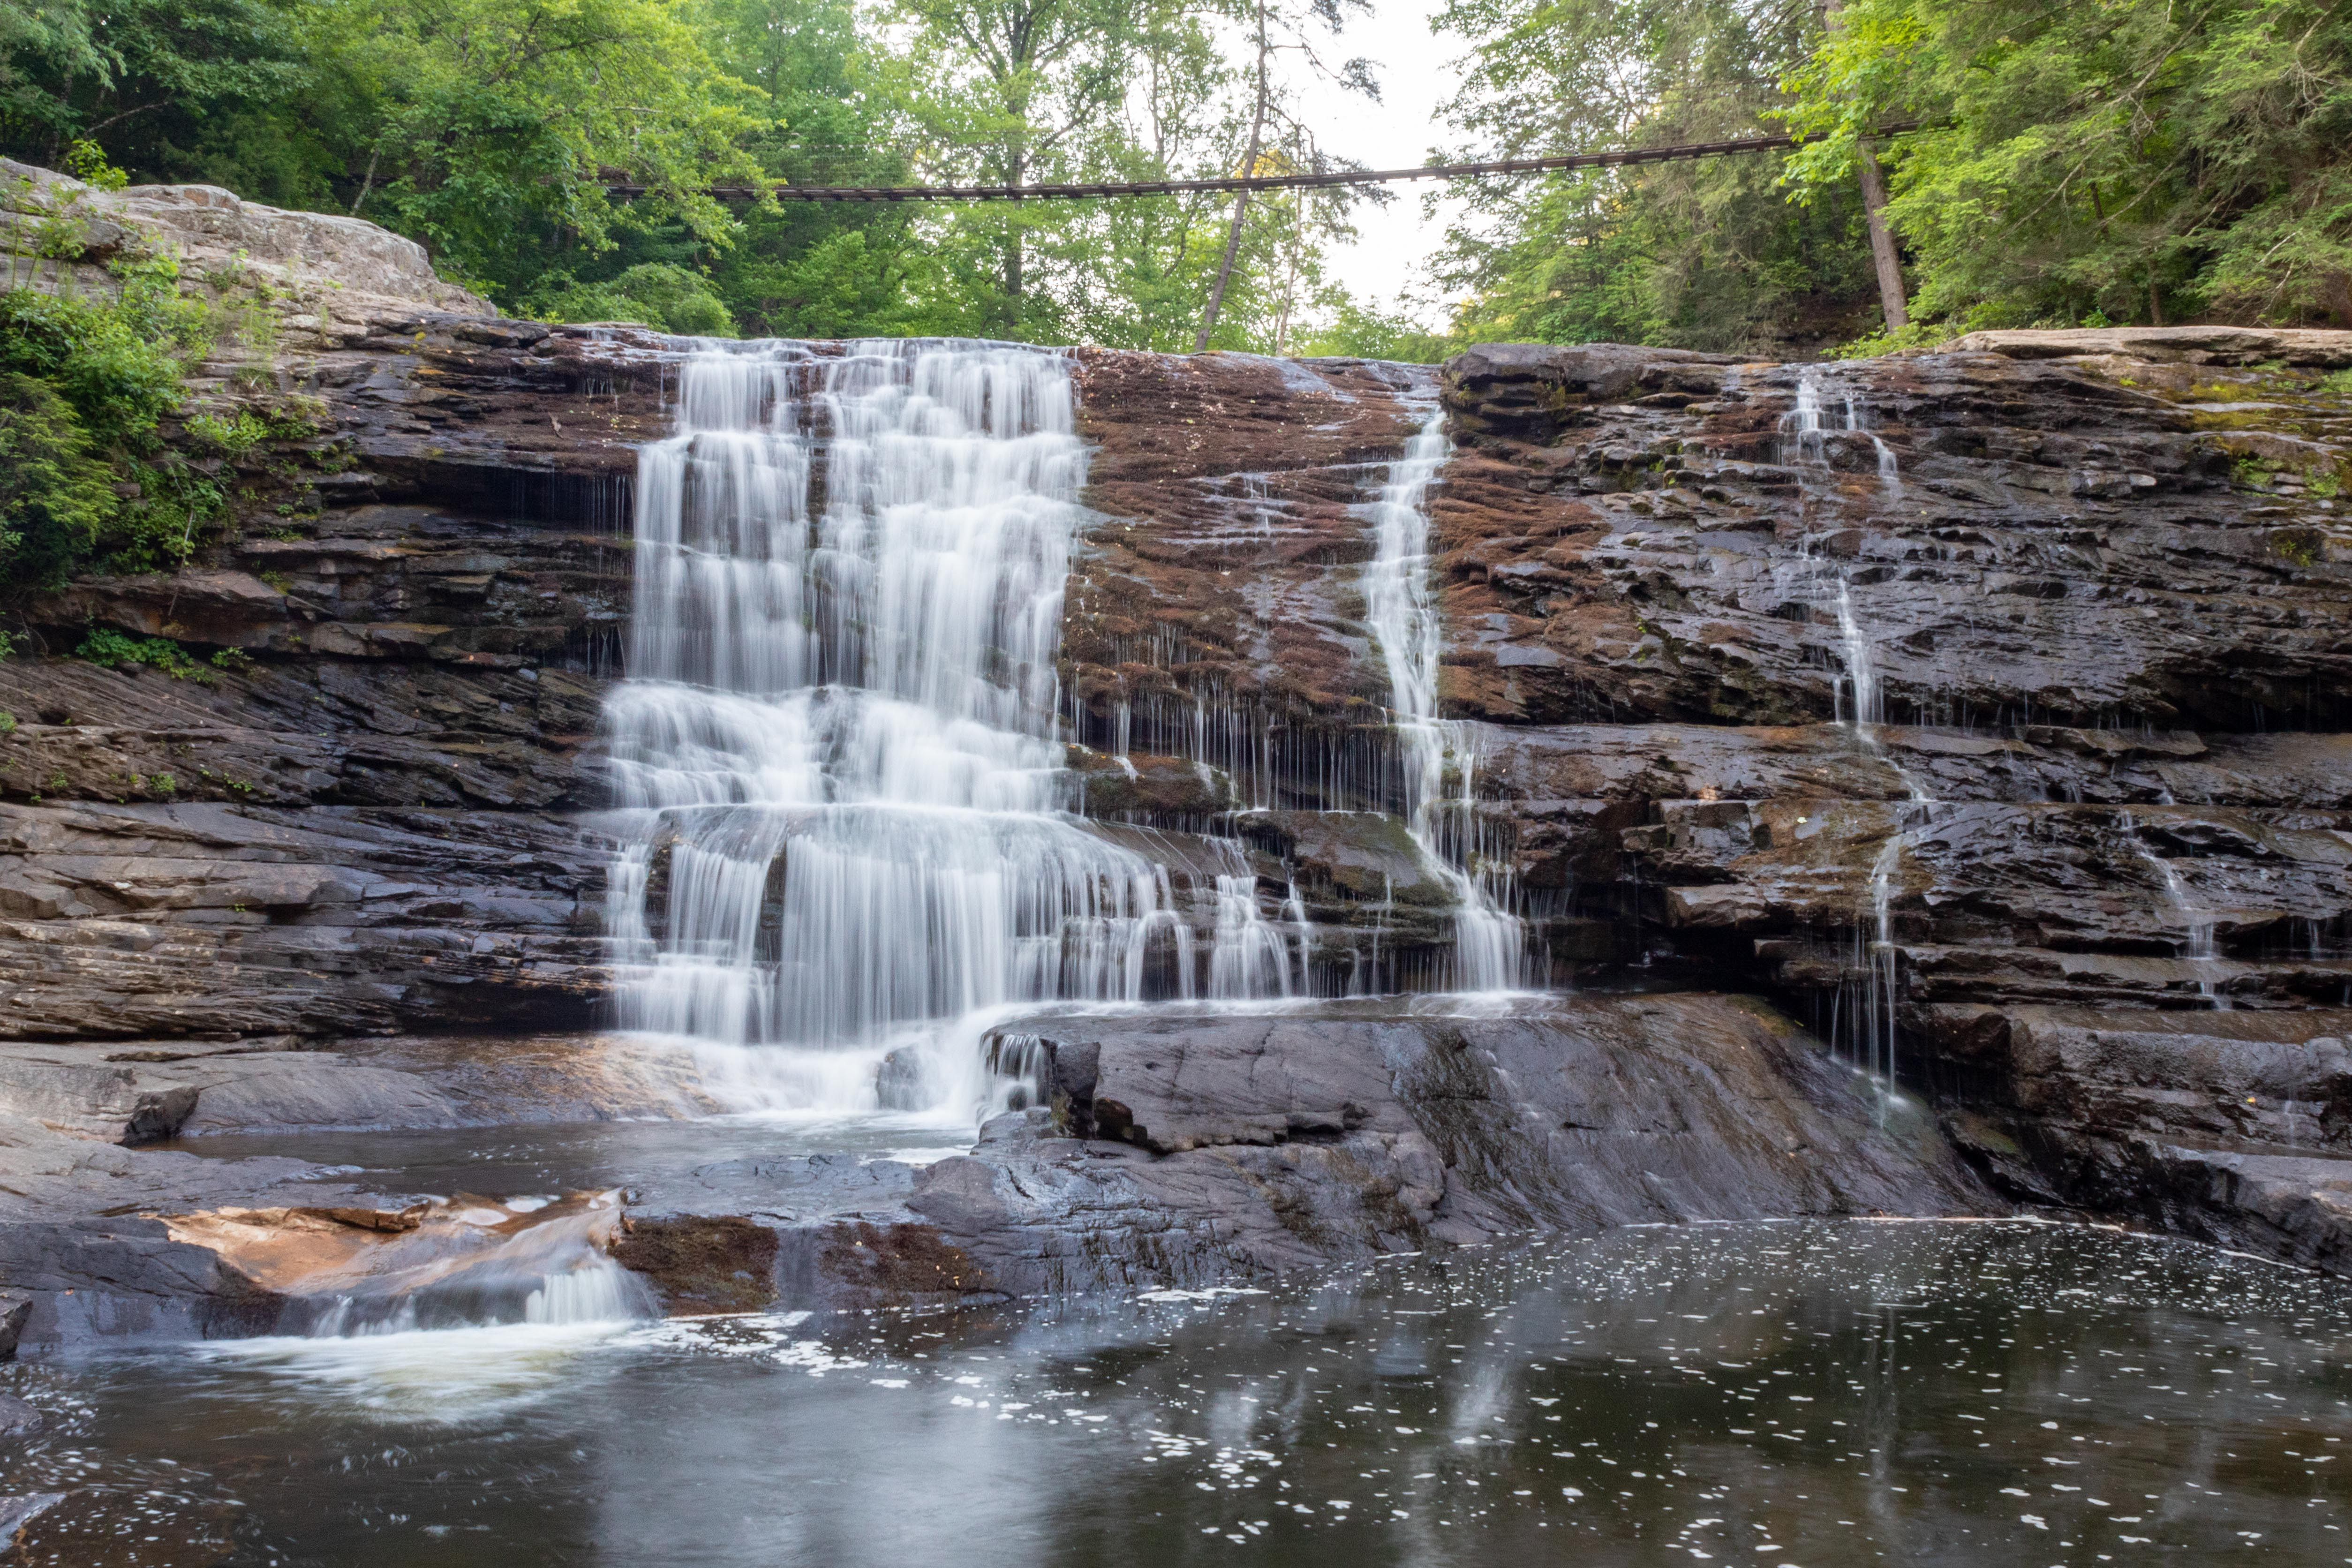 cane creek falls rockhouse falls fall creek falls state park tennessee hiking nature outdoors